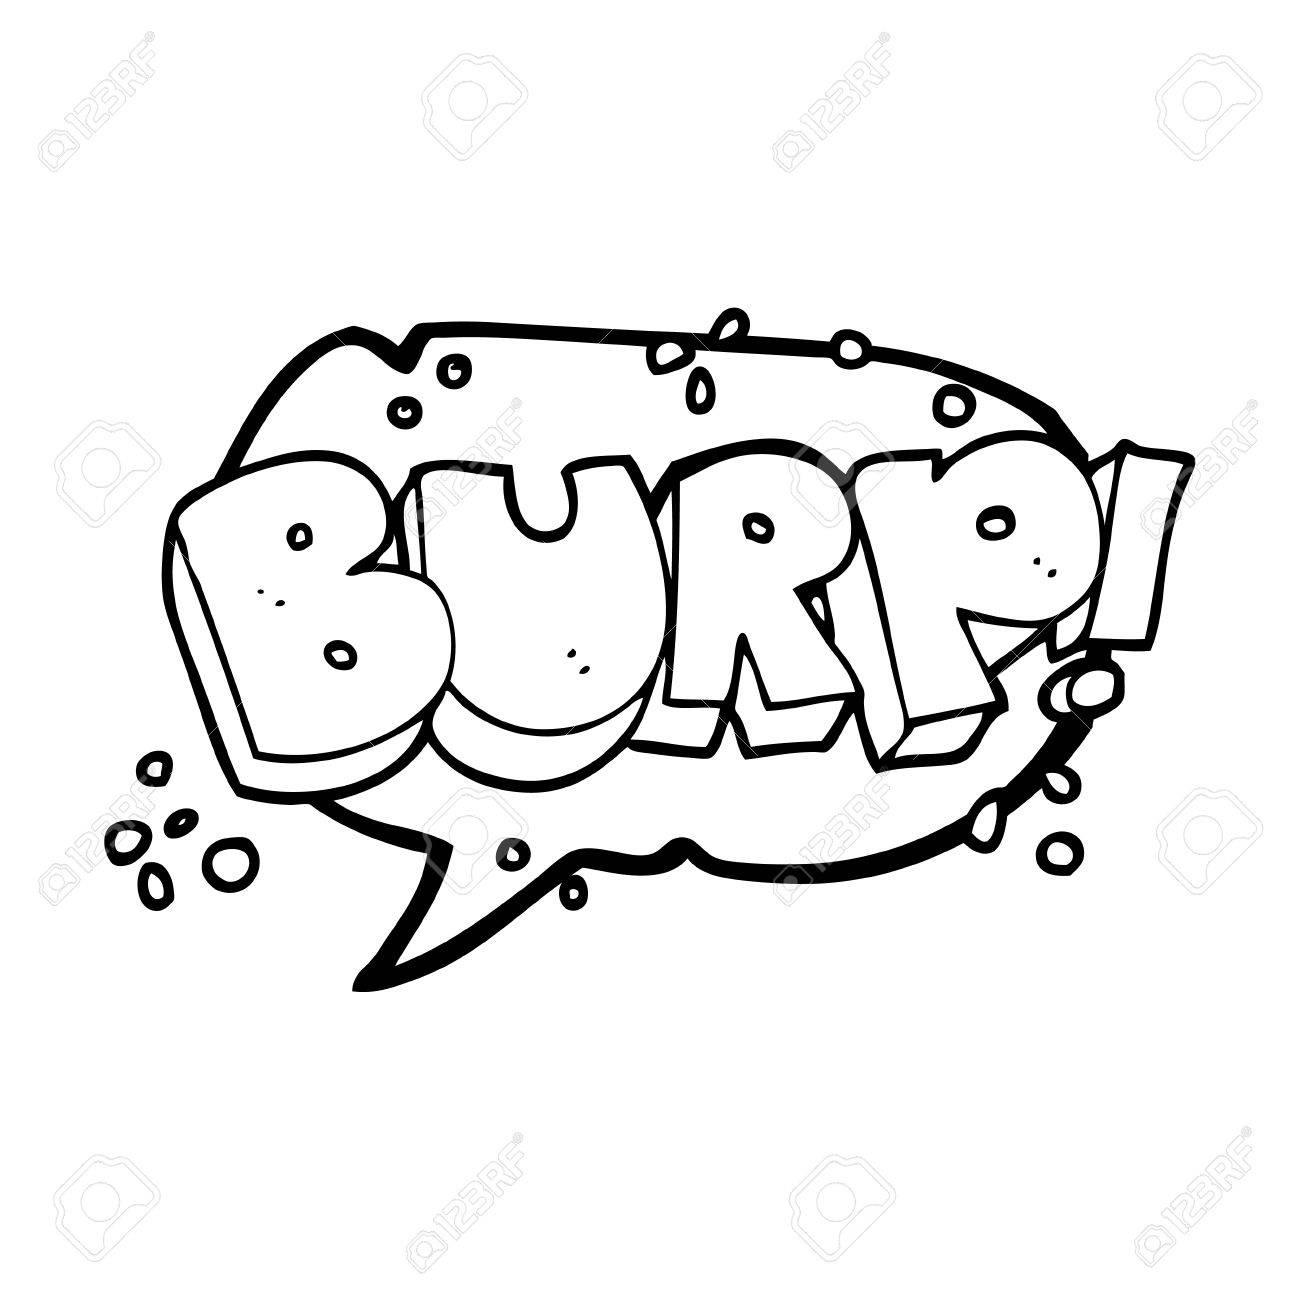 1300x1300 Freehand Drawn Speech Bubble Cartoon Burp Text Royalty Free